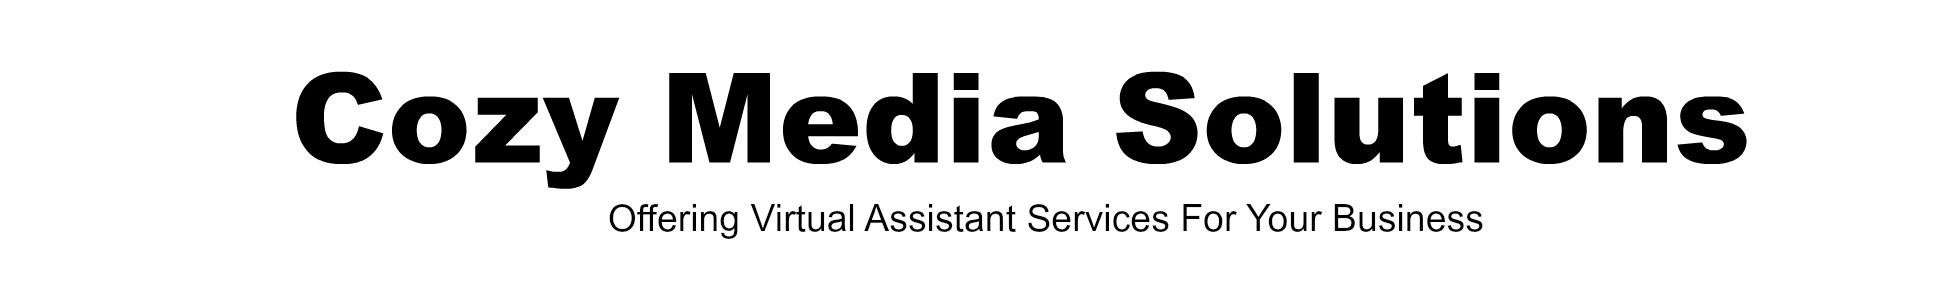 Cozy Media Solutions